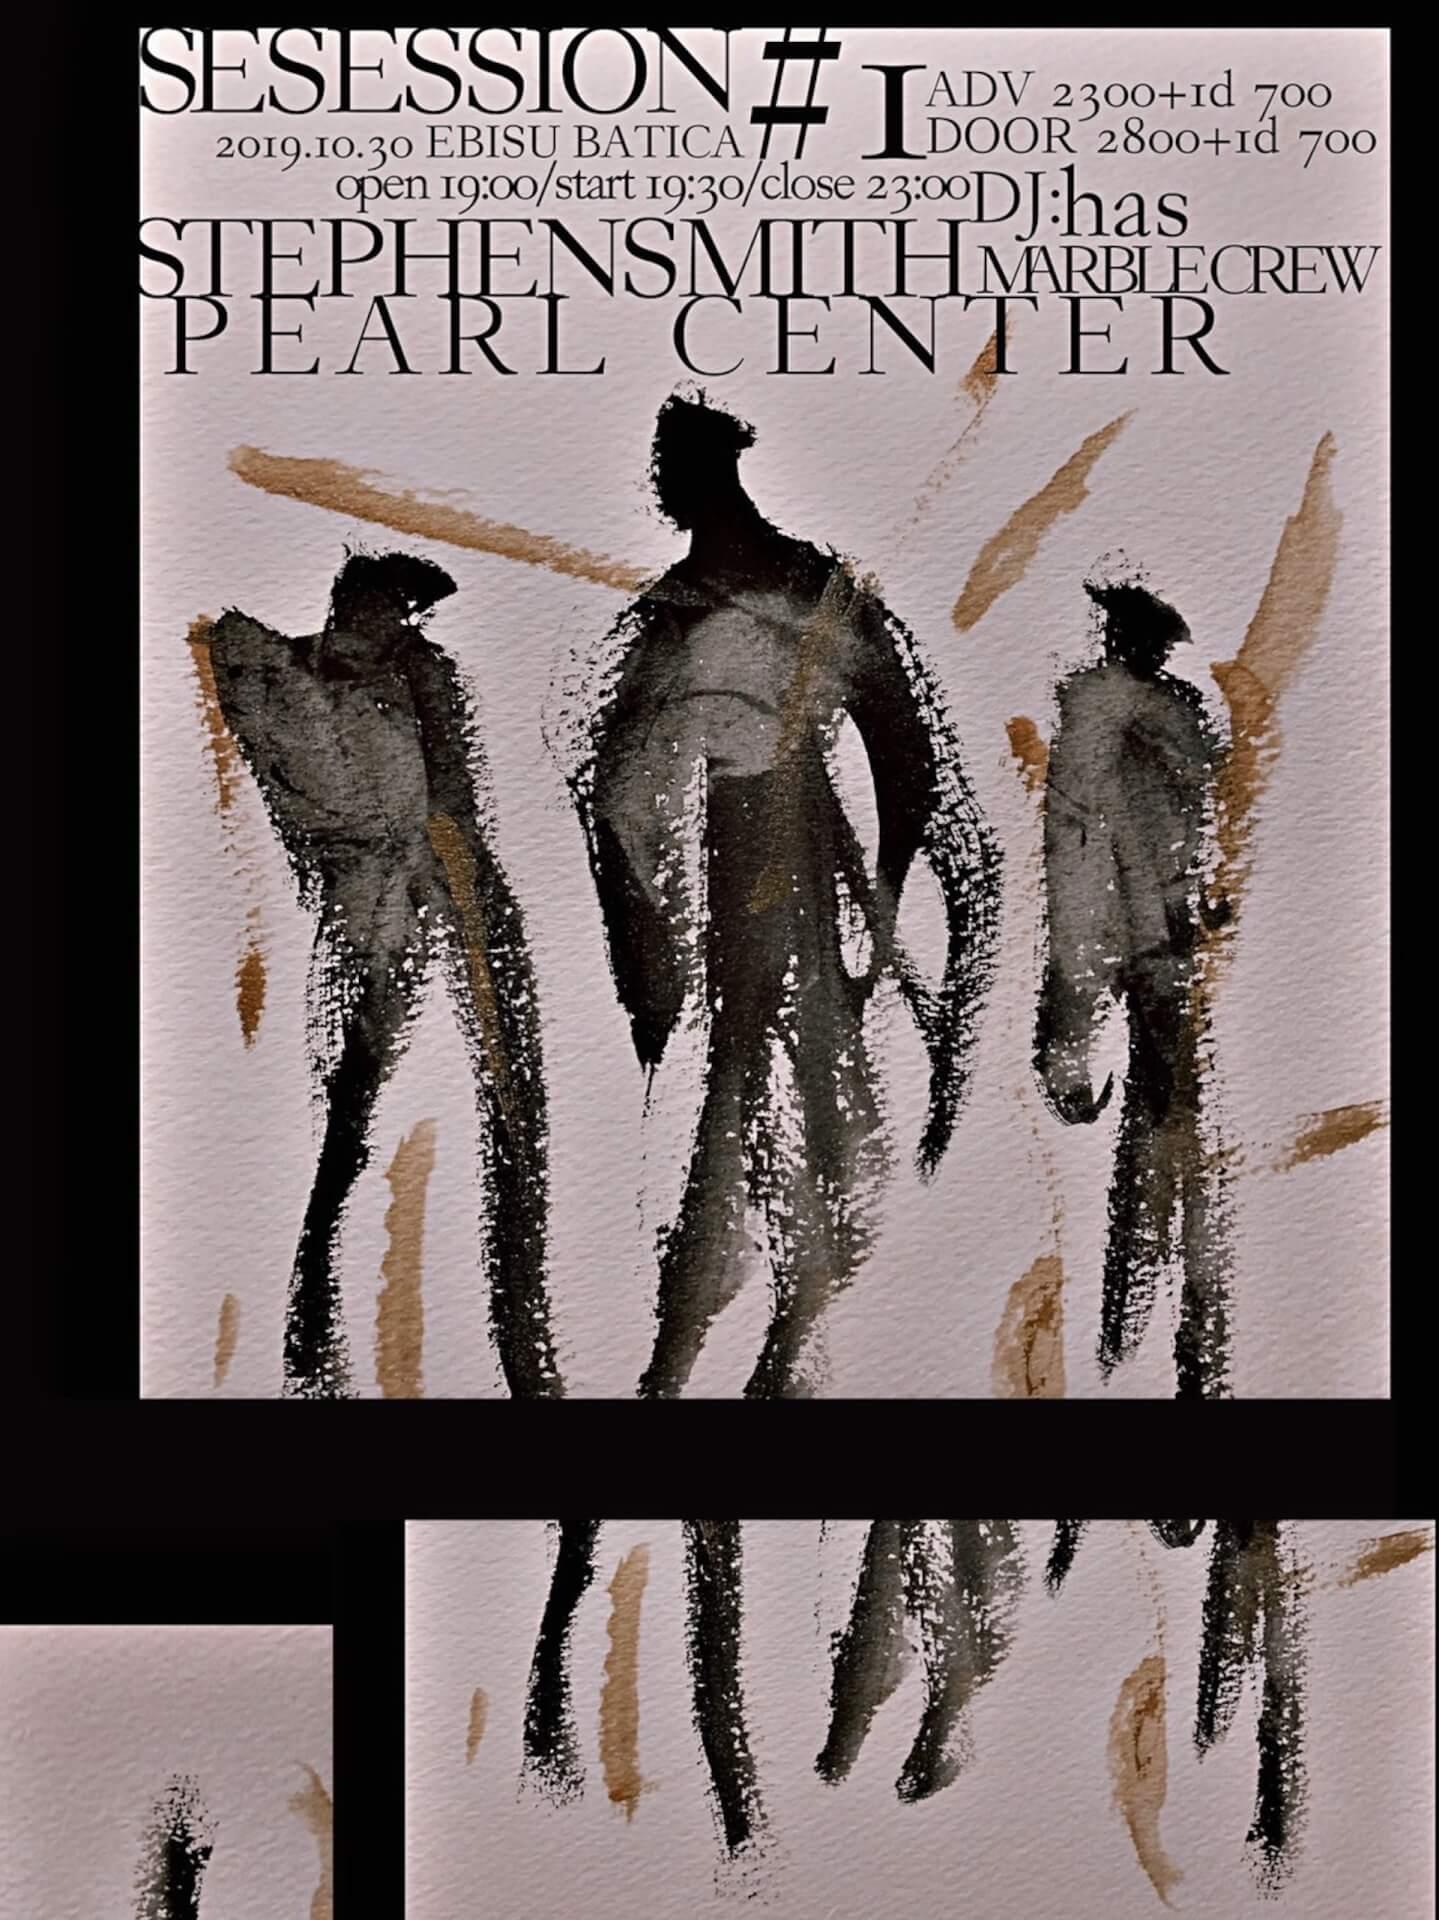 STEPHENSMITHが初の自主企画ライブシリーズ『SESESSION』をスタート 第一回ゲストはPEARL CENTER music191027-stephensmith-1